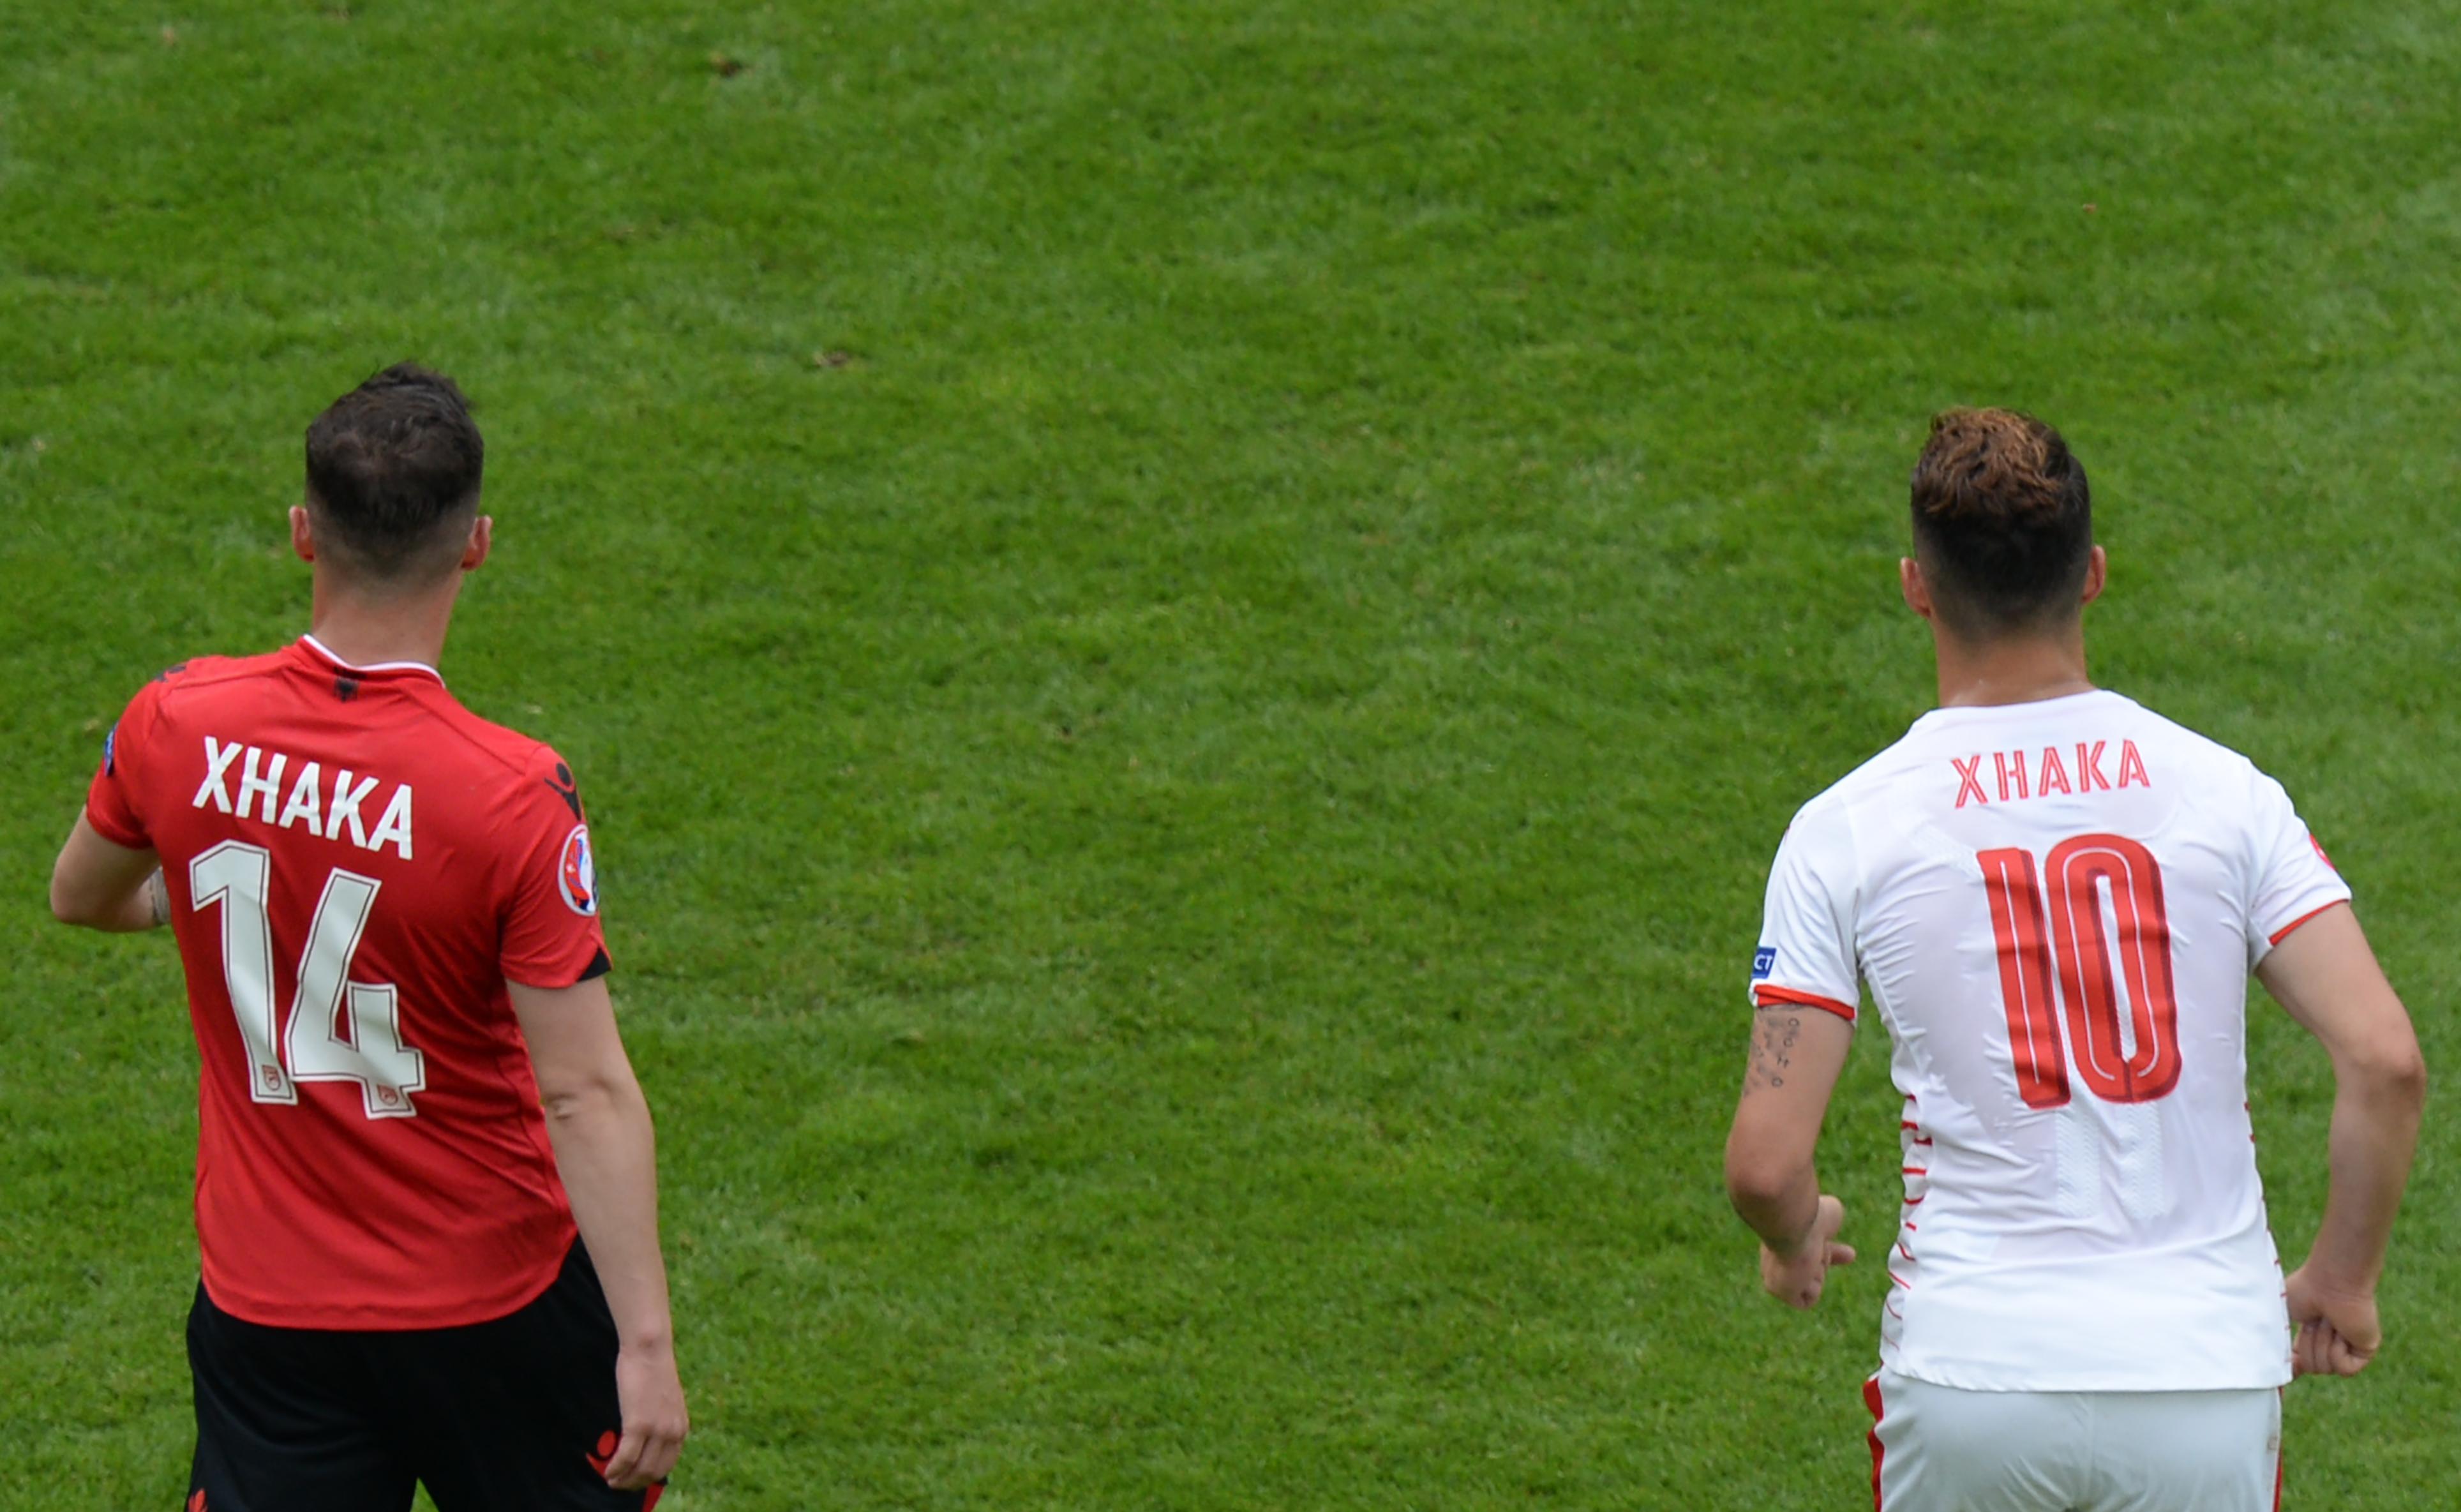 Xhaka brothers square off to make Euro history